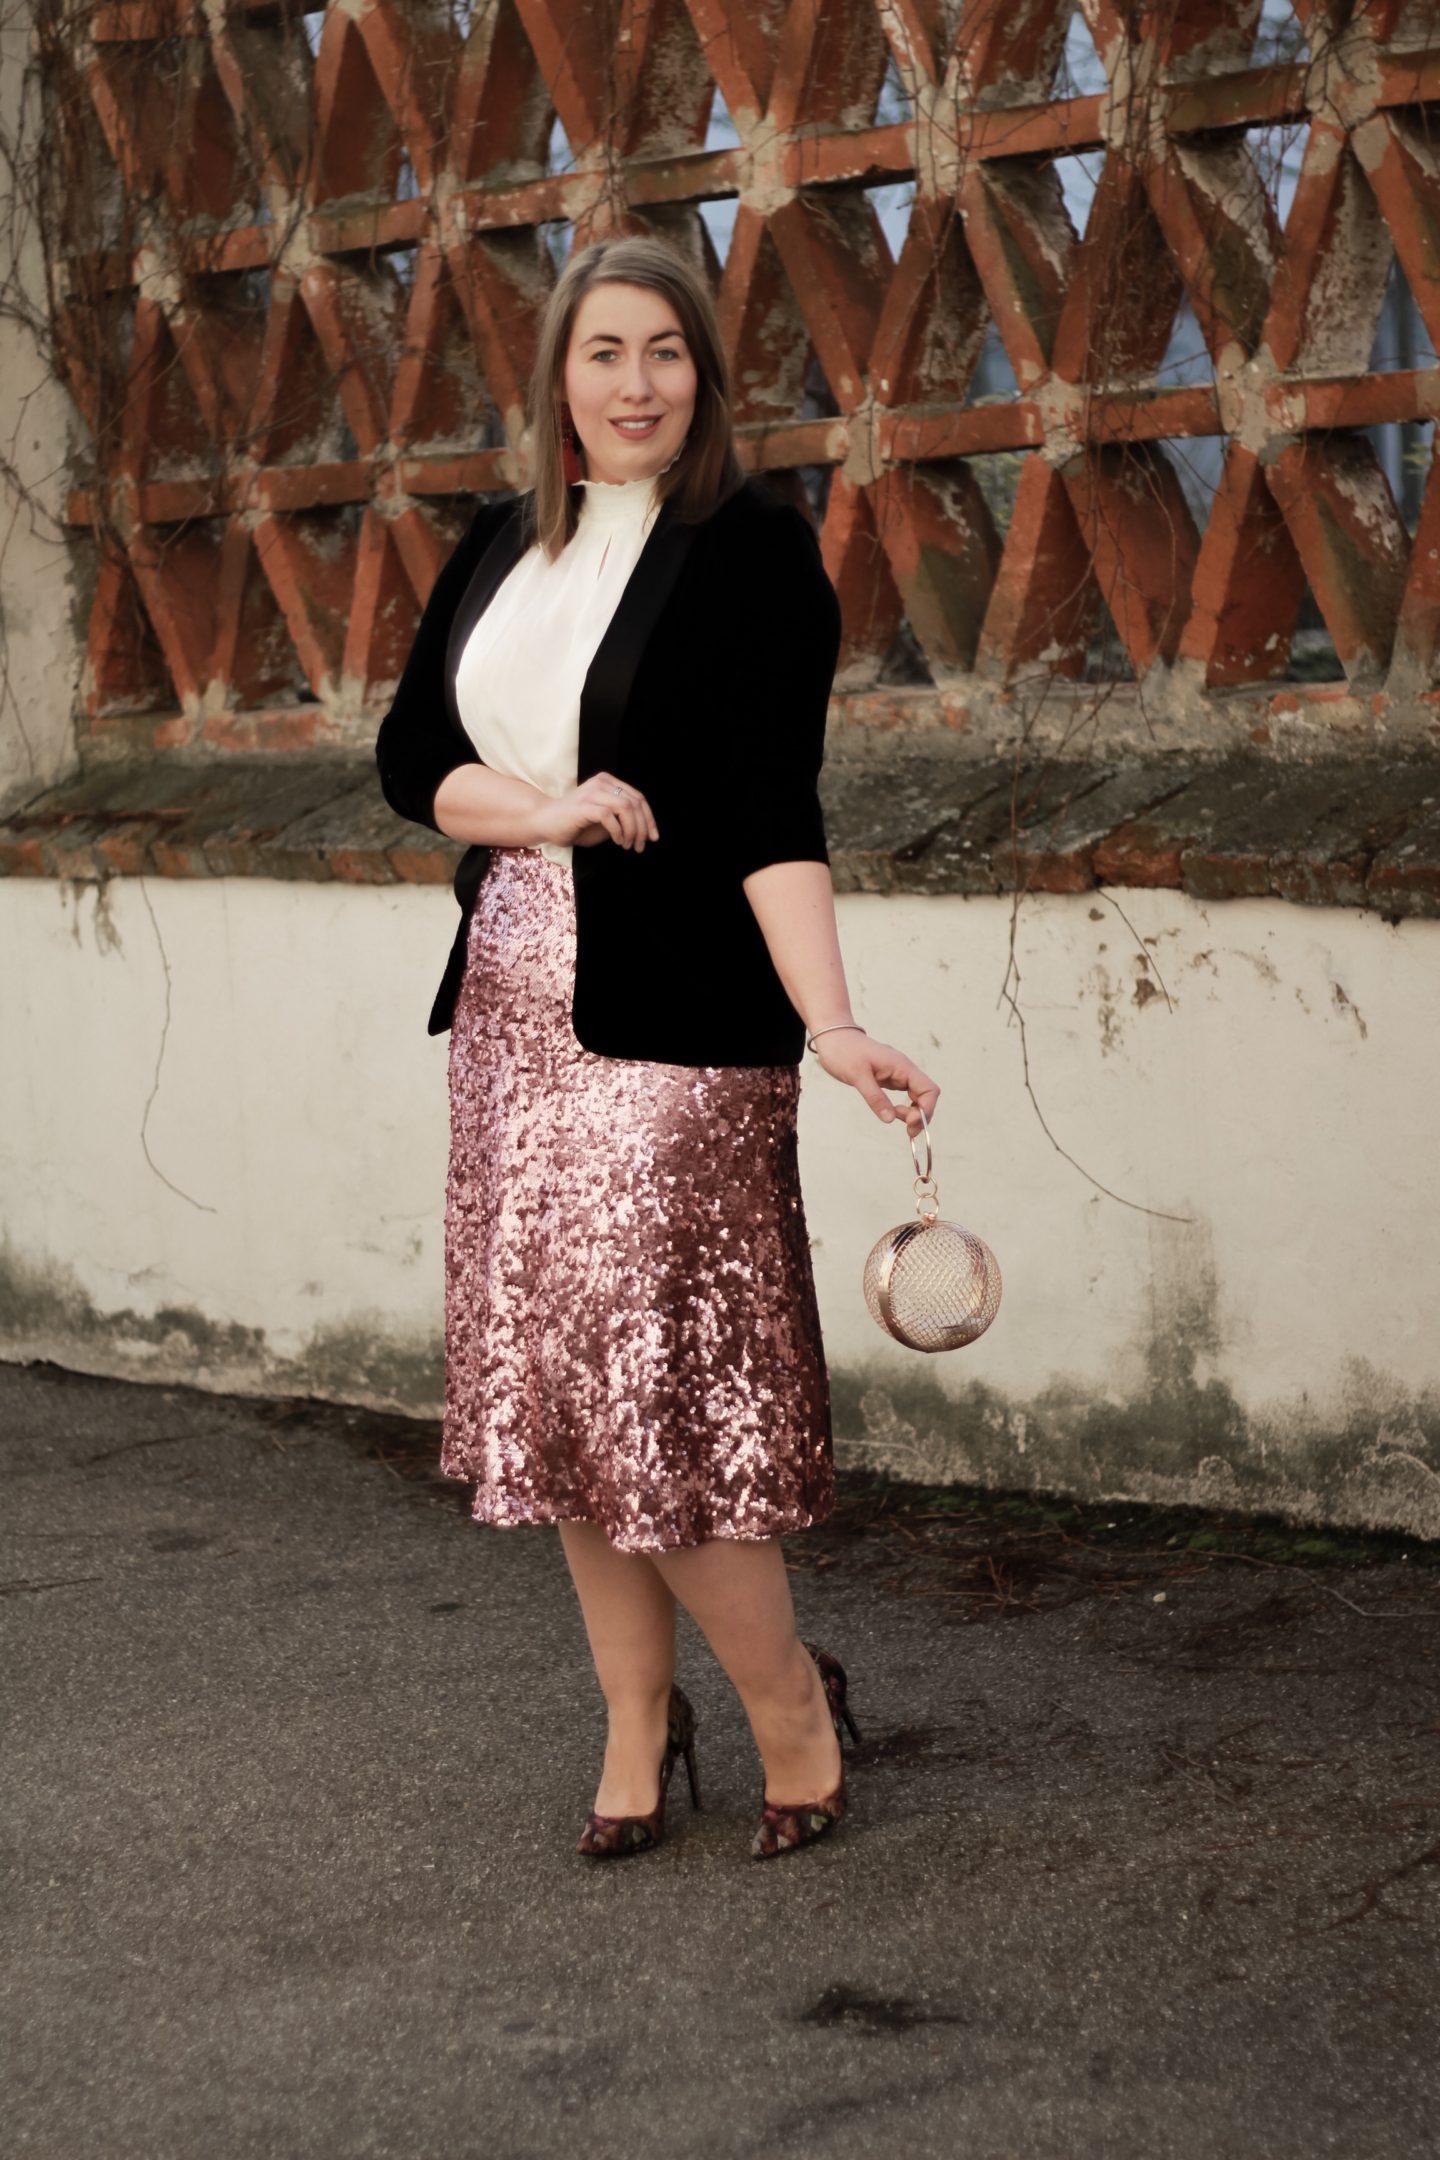 Miss-Suzie-Loves-Susanne-Heidebach-Silvester-Outfit-Pailletten-Rock-Samt-Blazer-Kaefig-Clutch-Fashionblogger-eleganter-Look